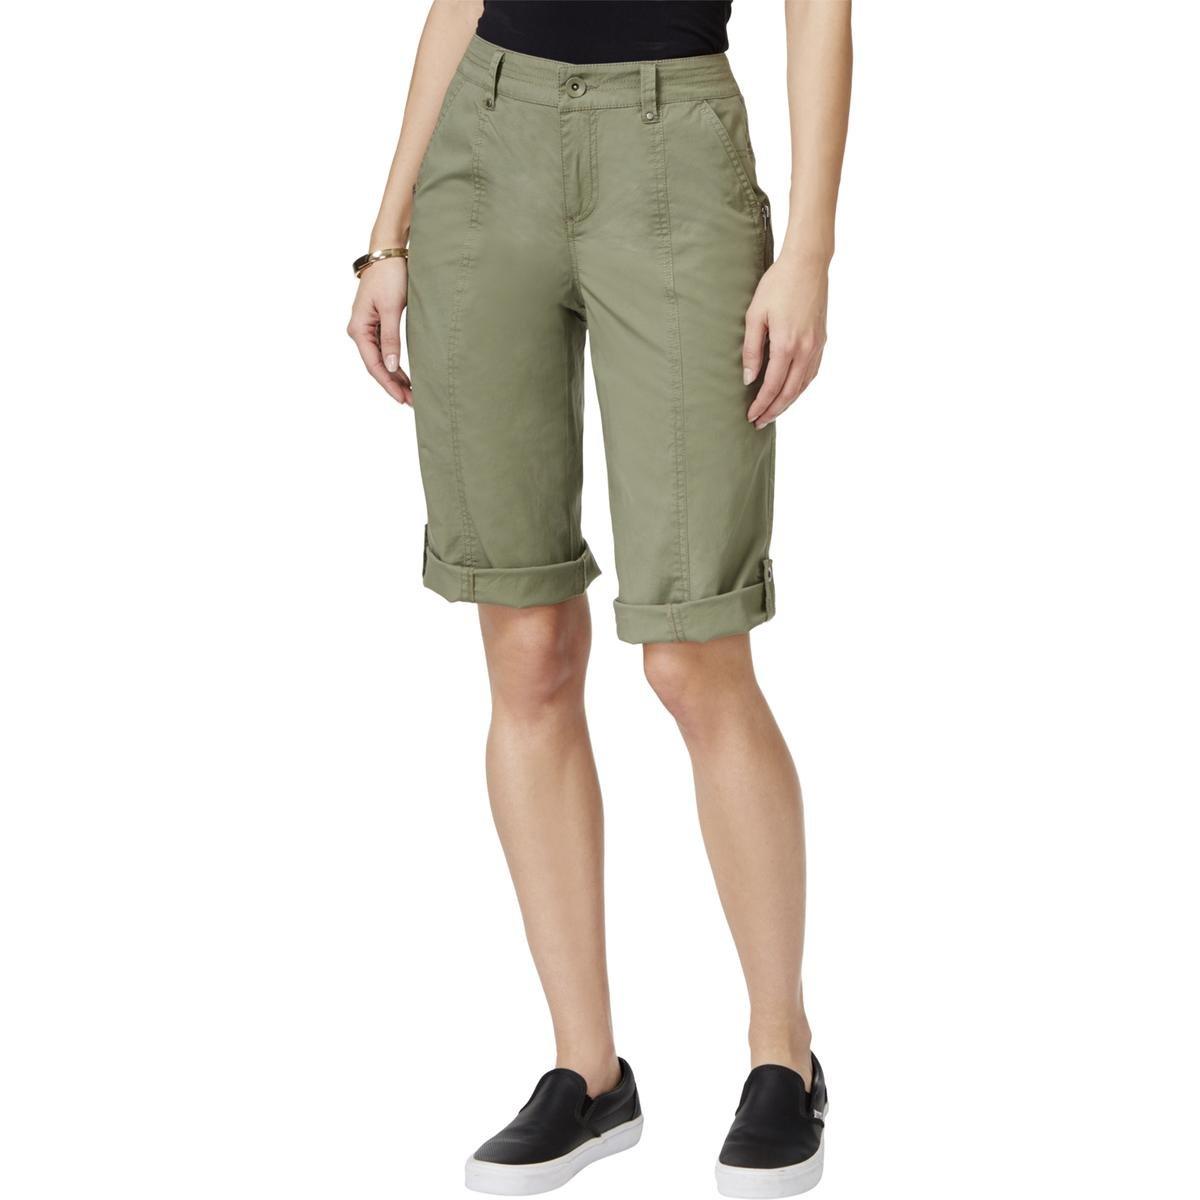 Style & Co. Womens Petites Cuffed Bermuda Cargo Shorts Green 2P